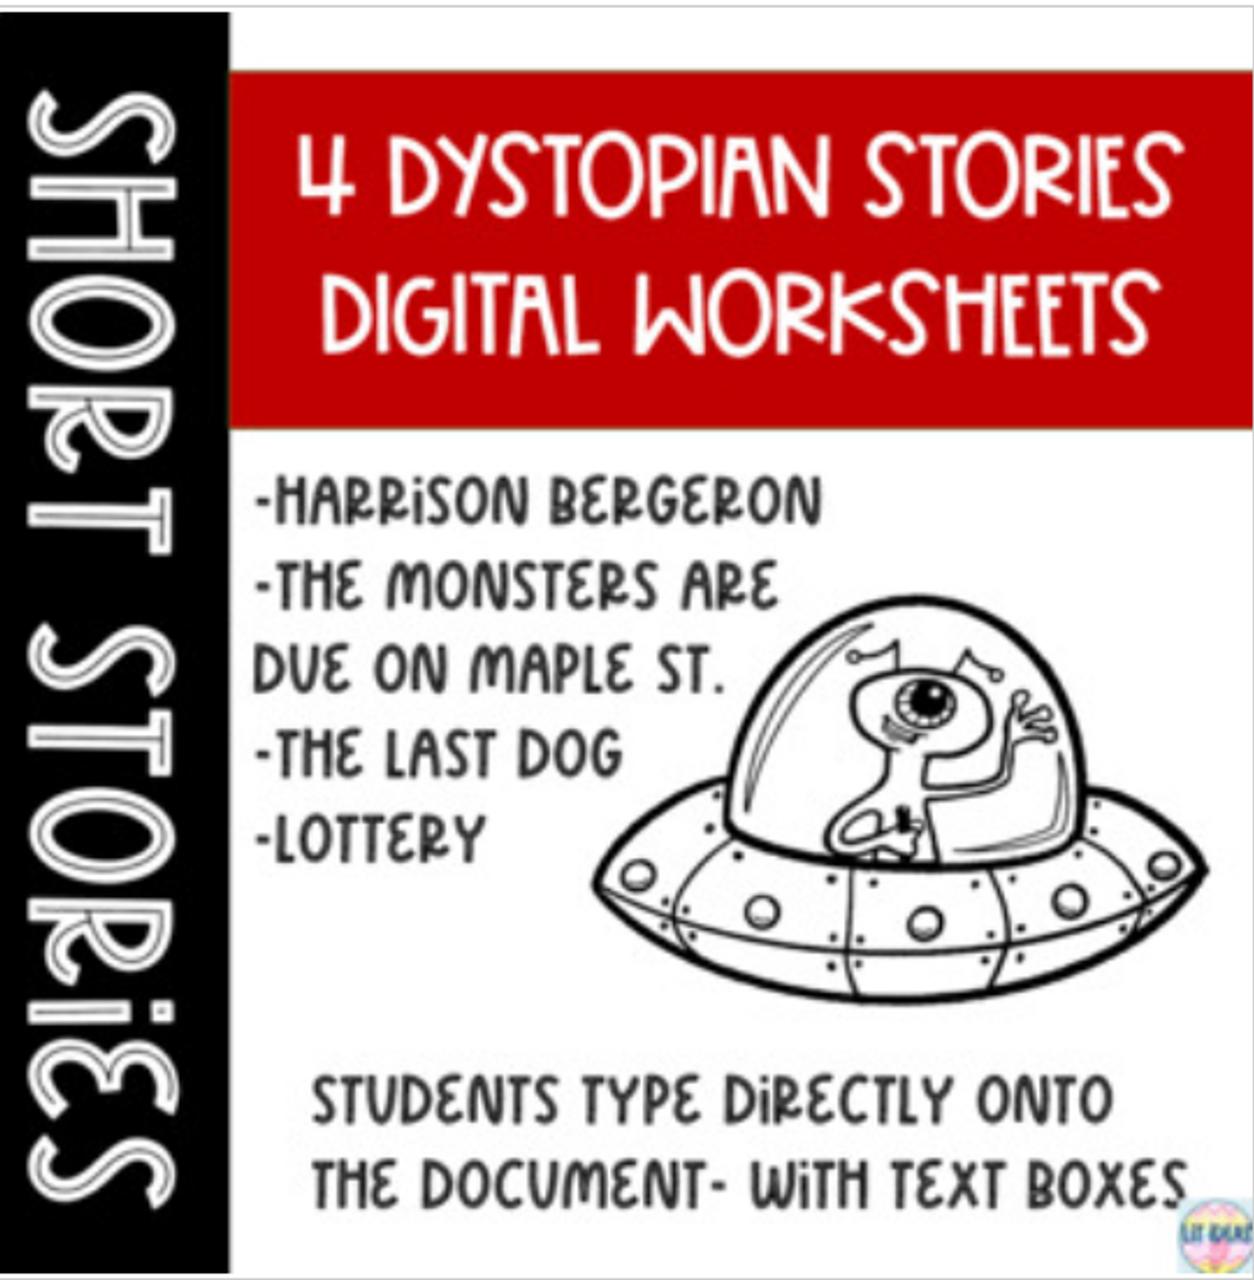 Dystopian Short Stories DIGITAL worksheets and Hard Copies